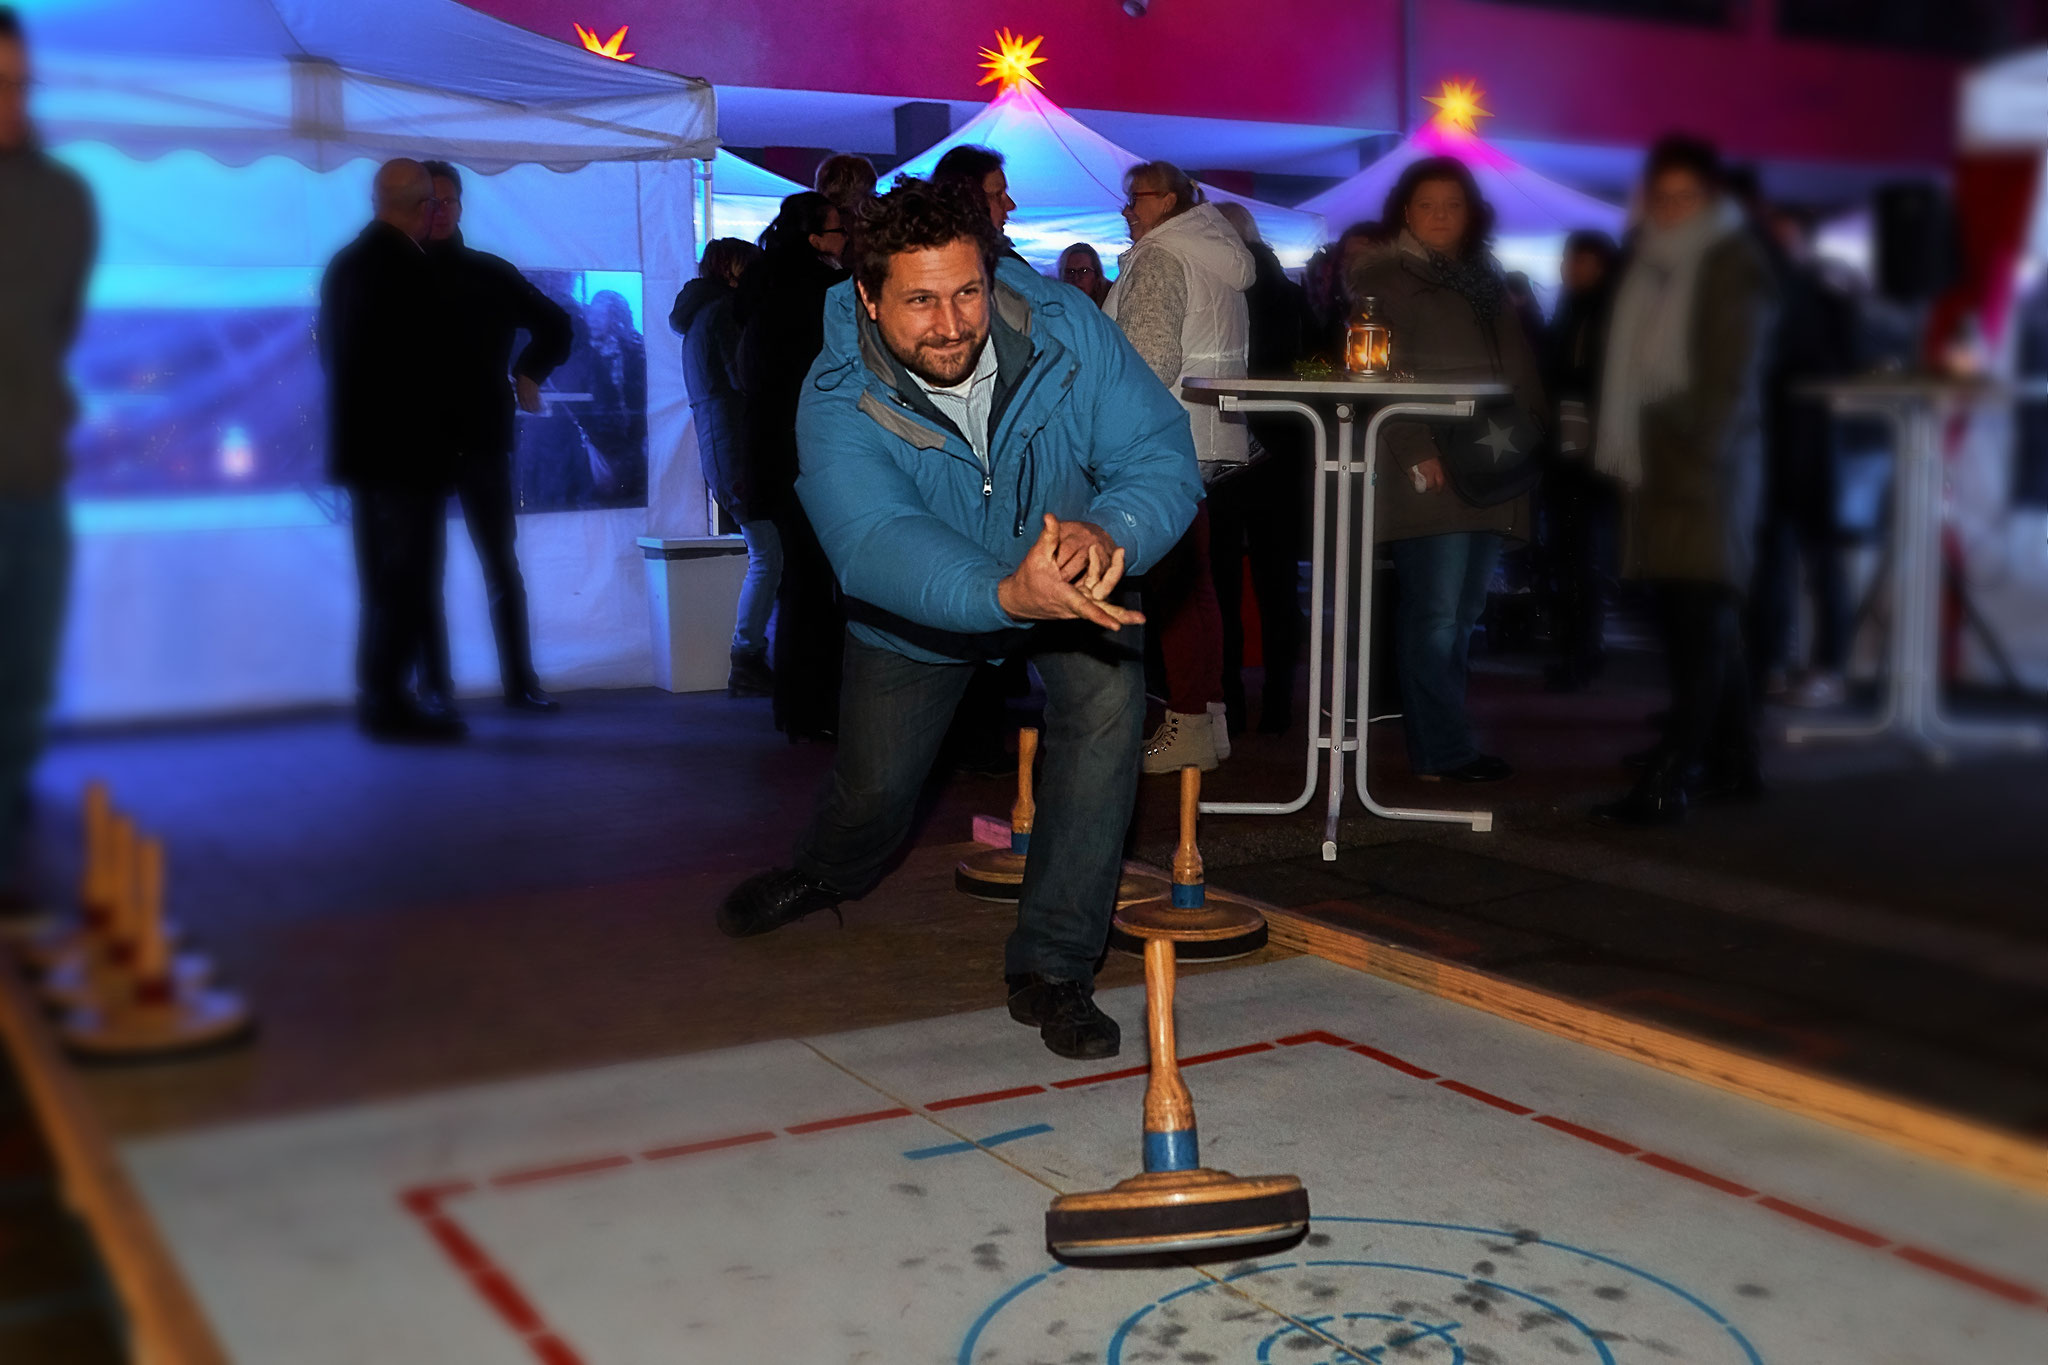 Viel Spaß bei Teambuilding mit Curlingbahn